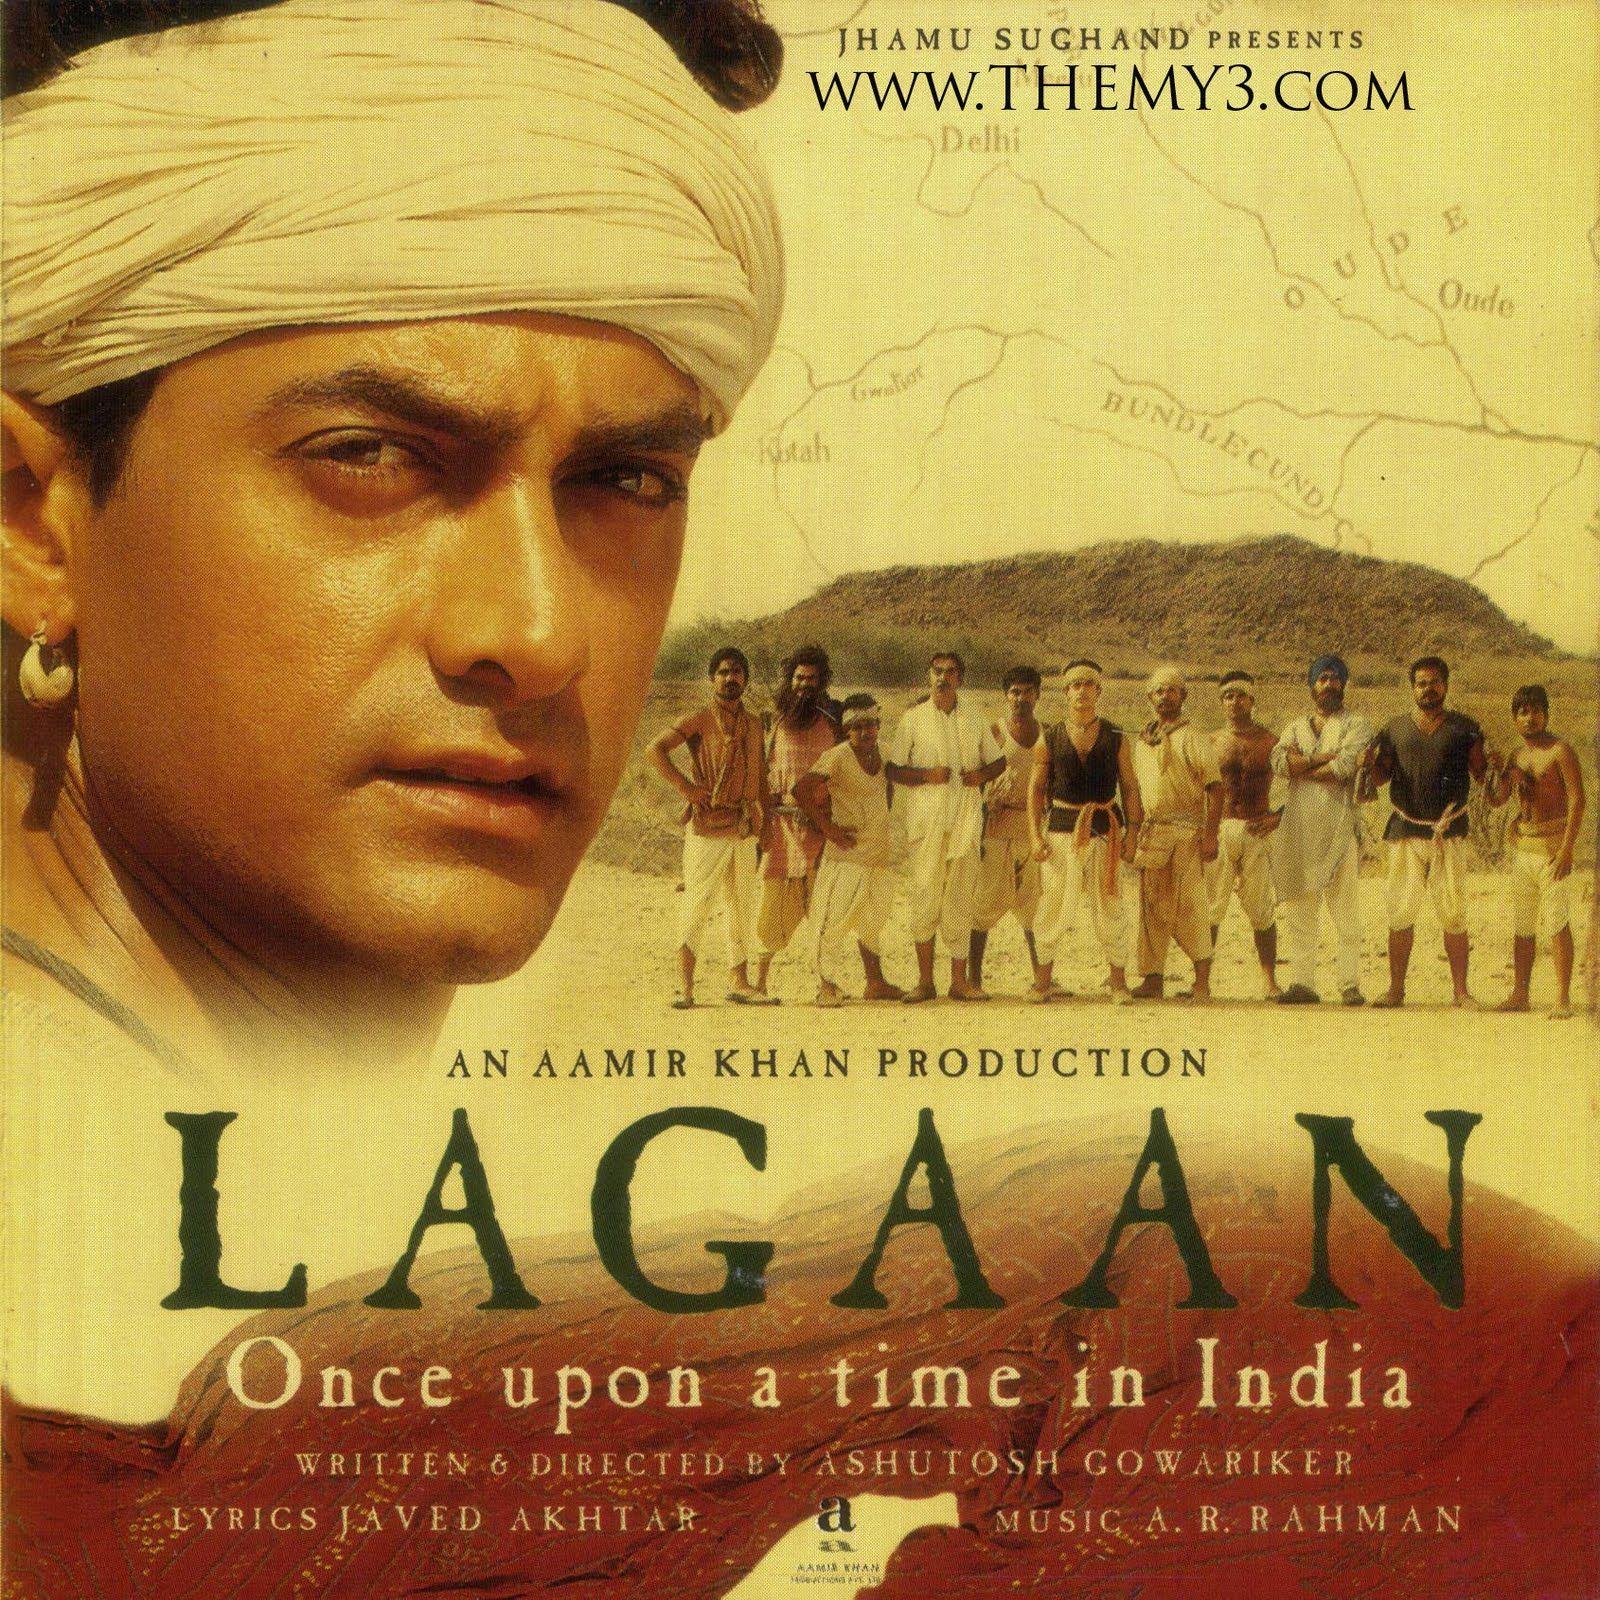 Hindi Film 101: Aamir Khan's Filmograpy Part 2, Baazi to Dil Chahta